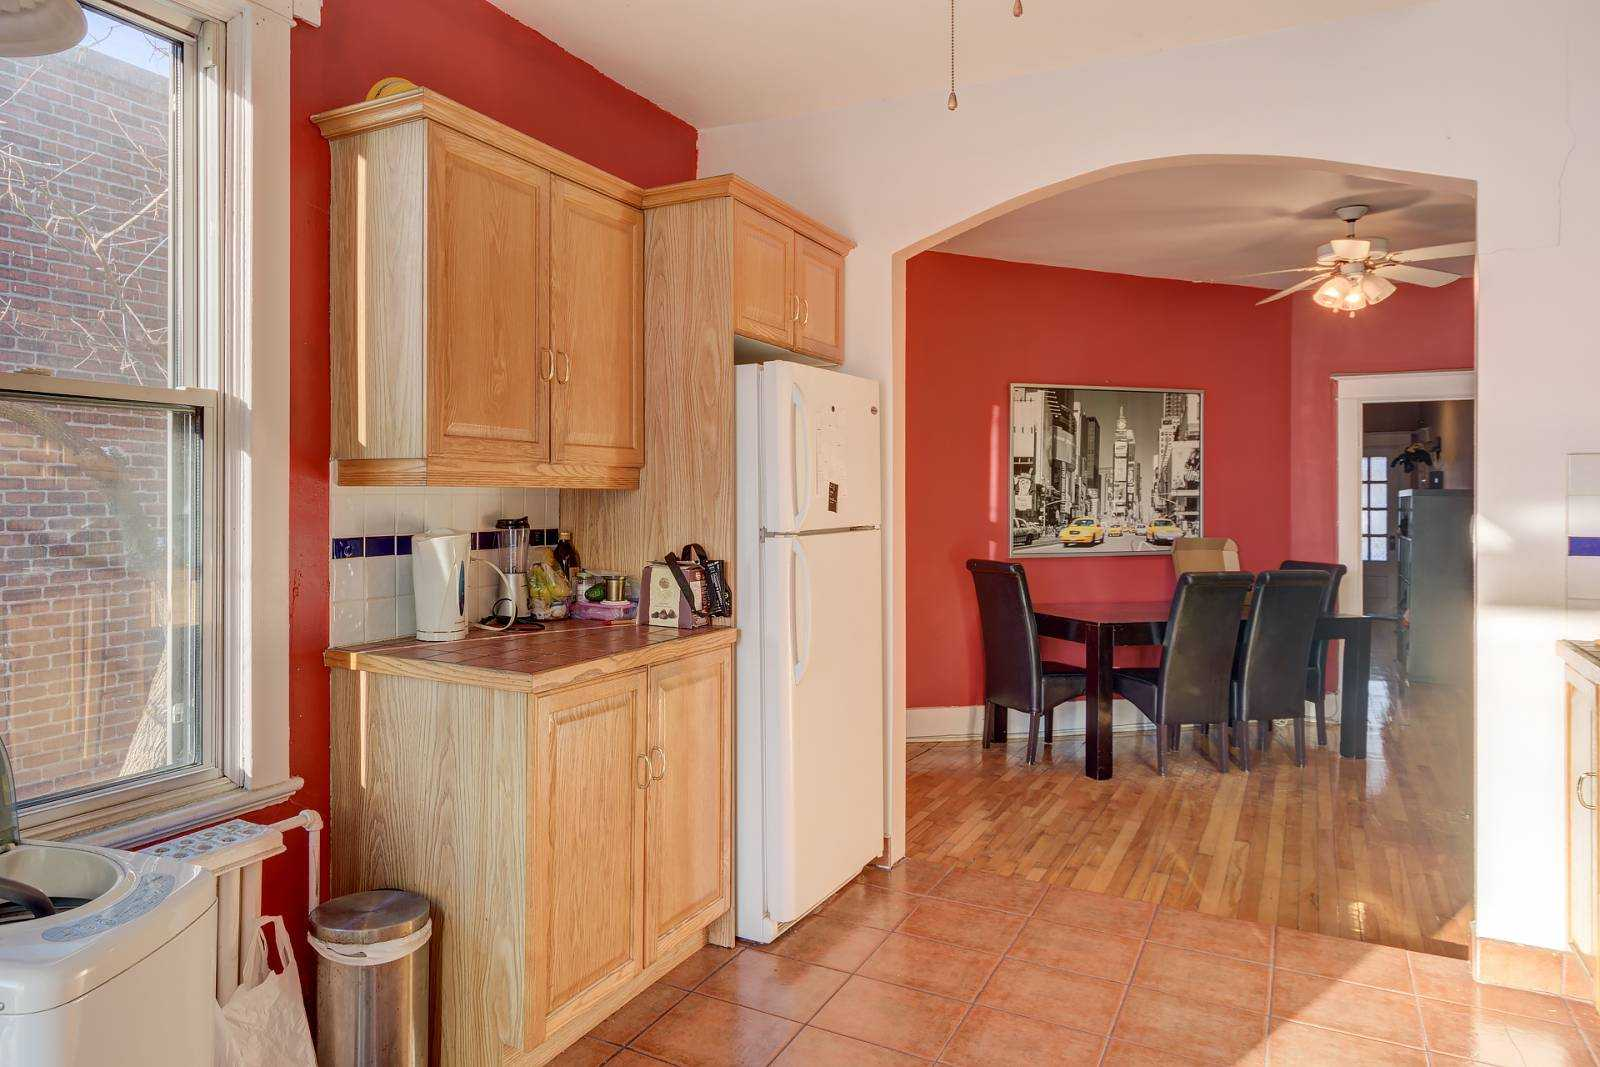 rooms-to-rent-mtl-kitchen-4